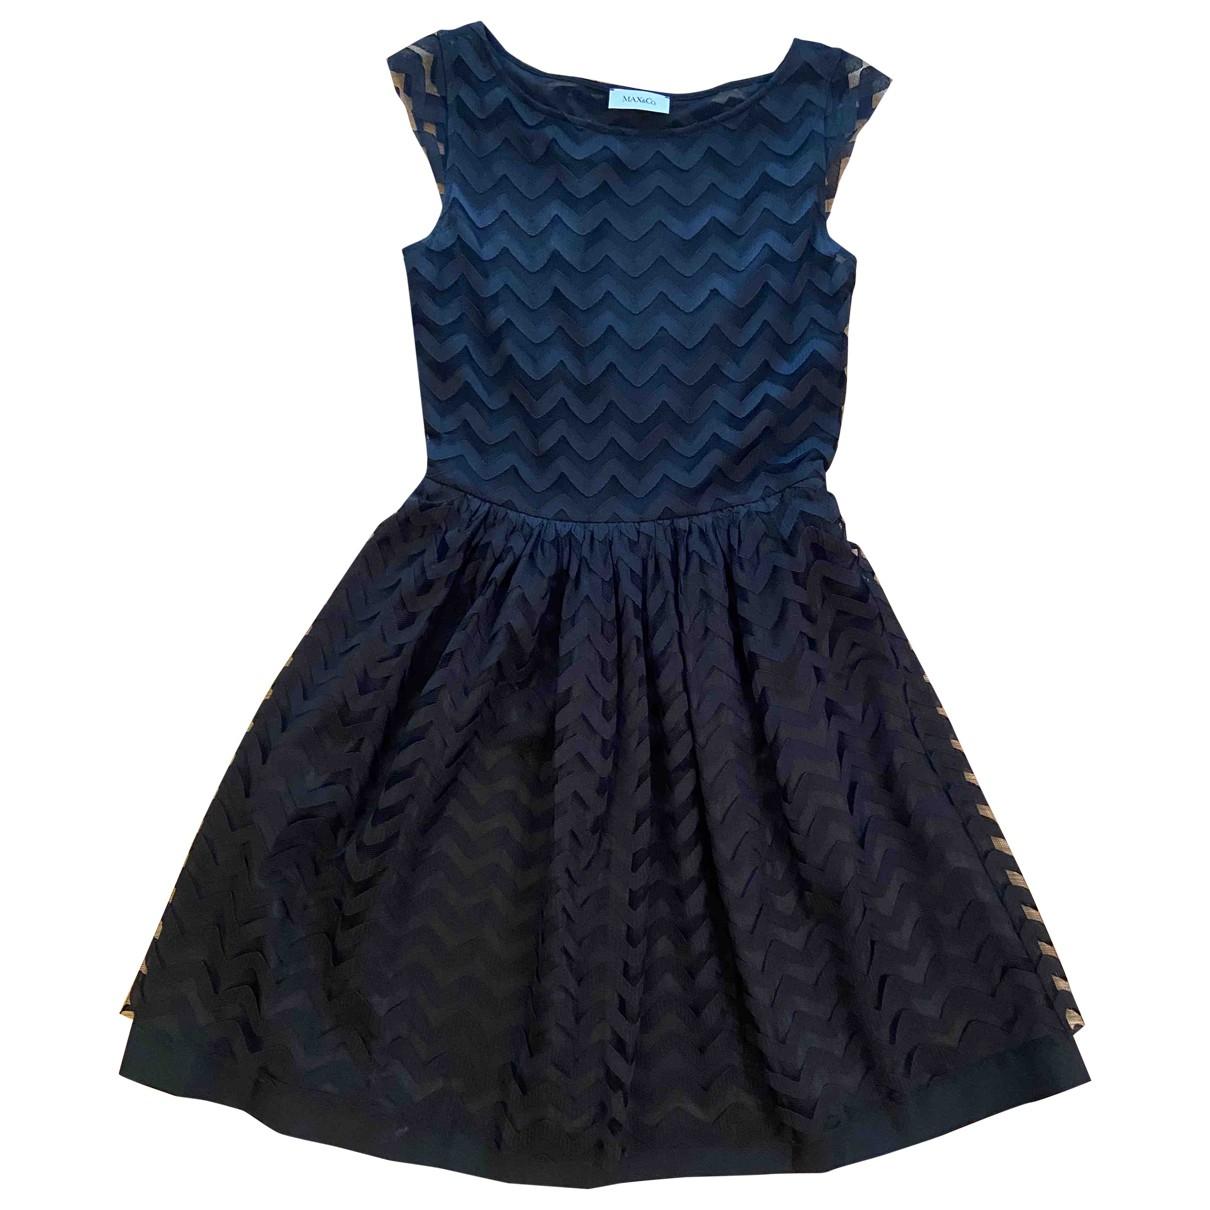 Max & Co \N Black dress for Women XS International